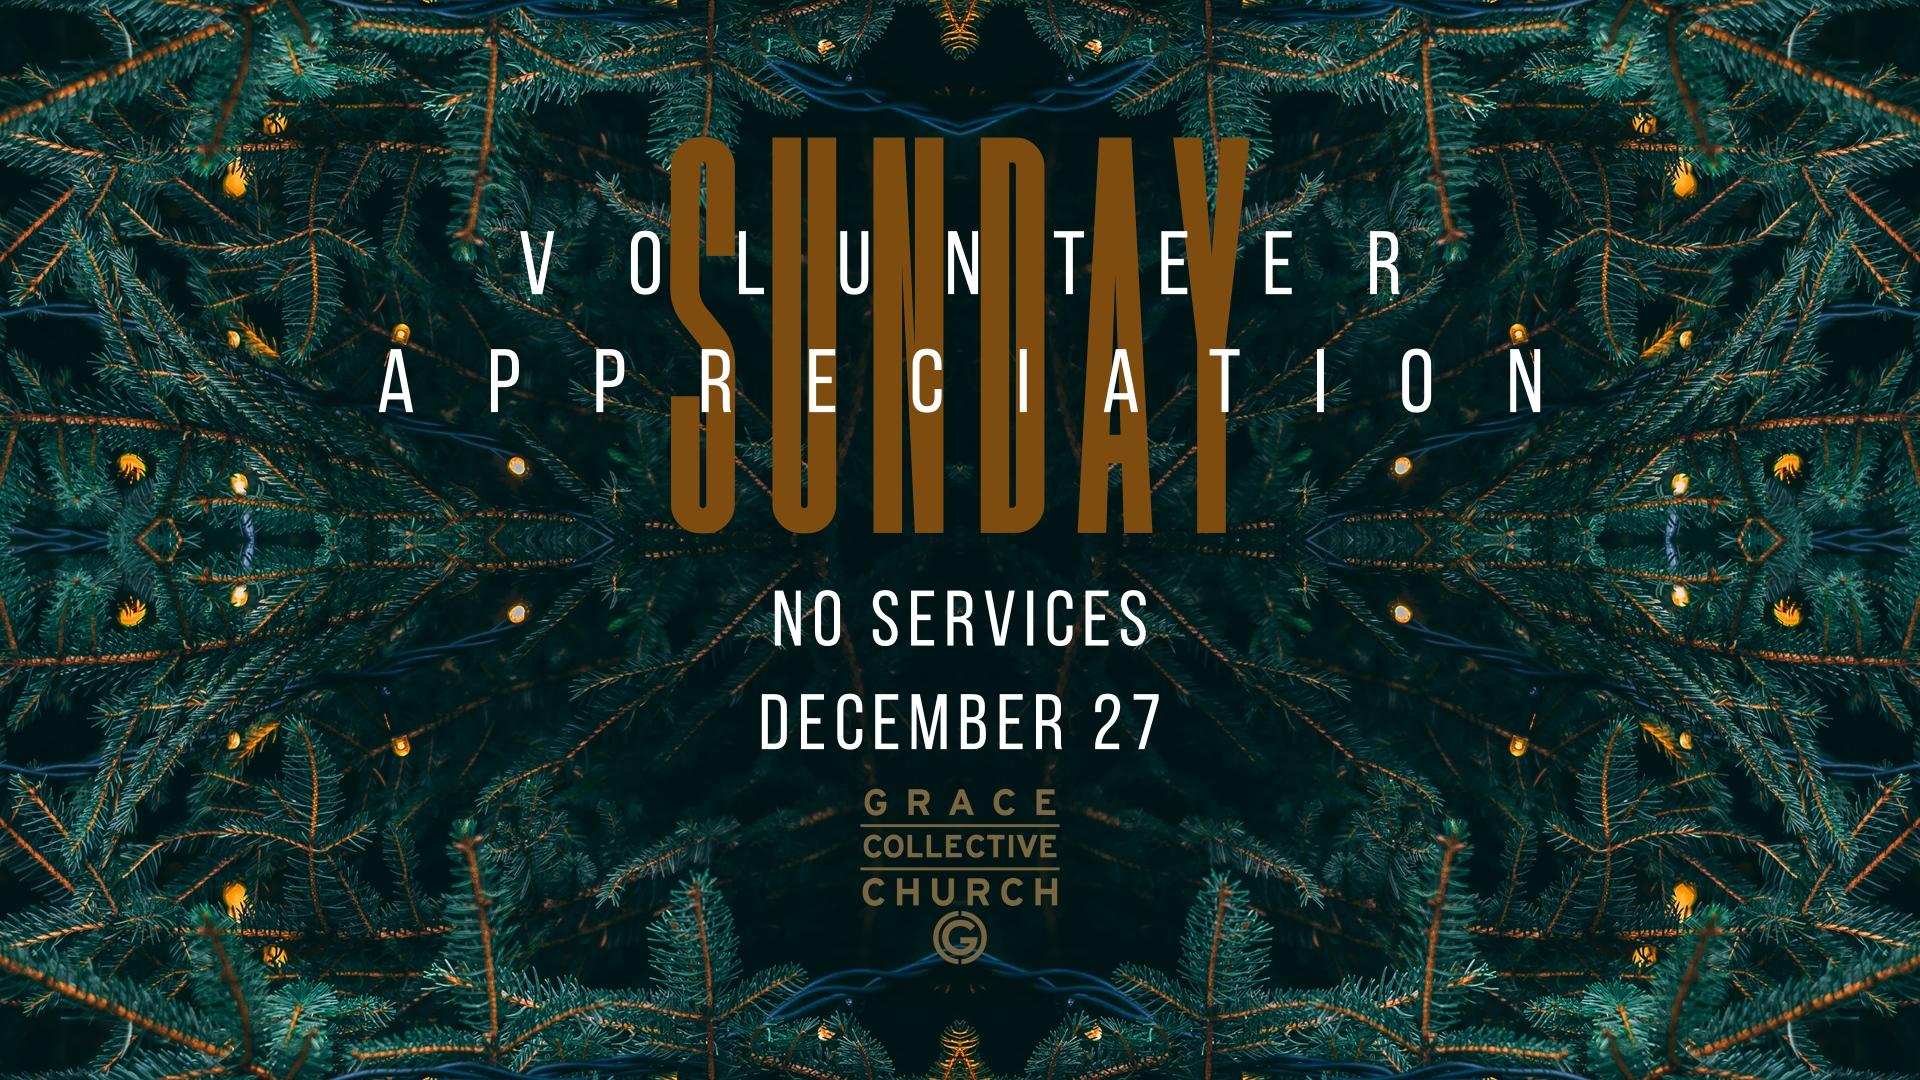 NO SERVICES December 27, 2020